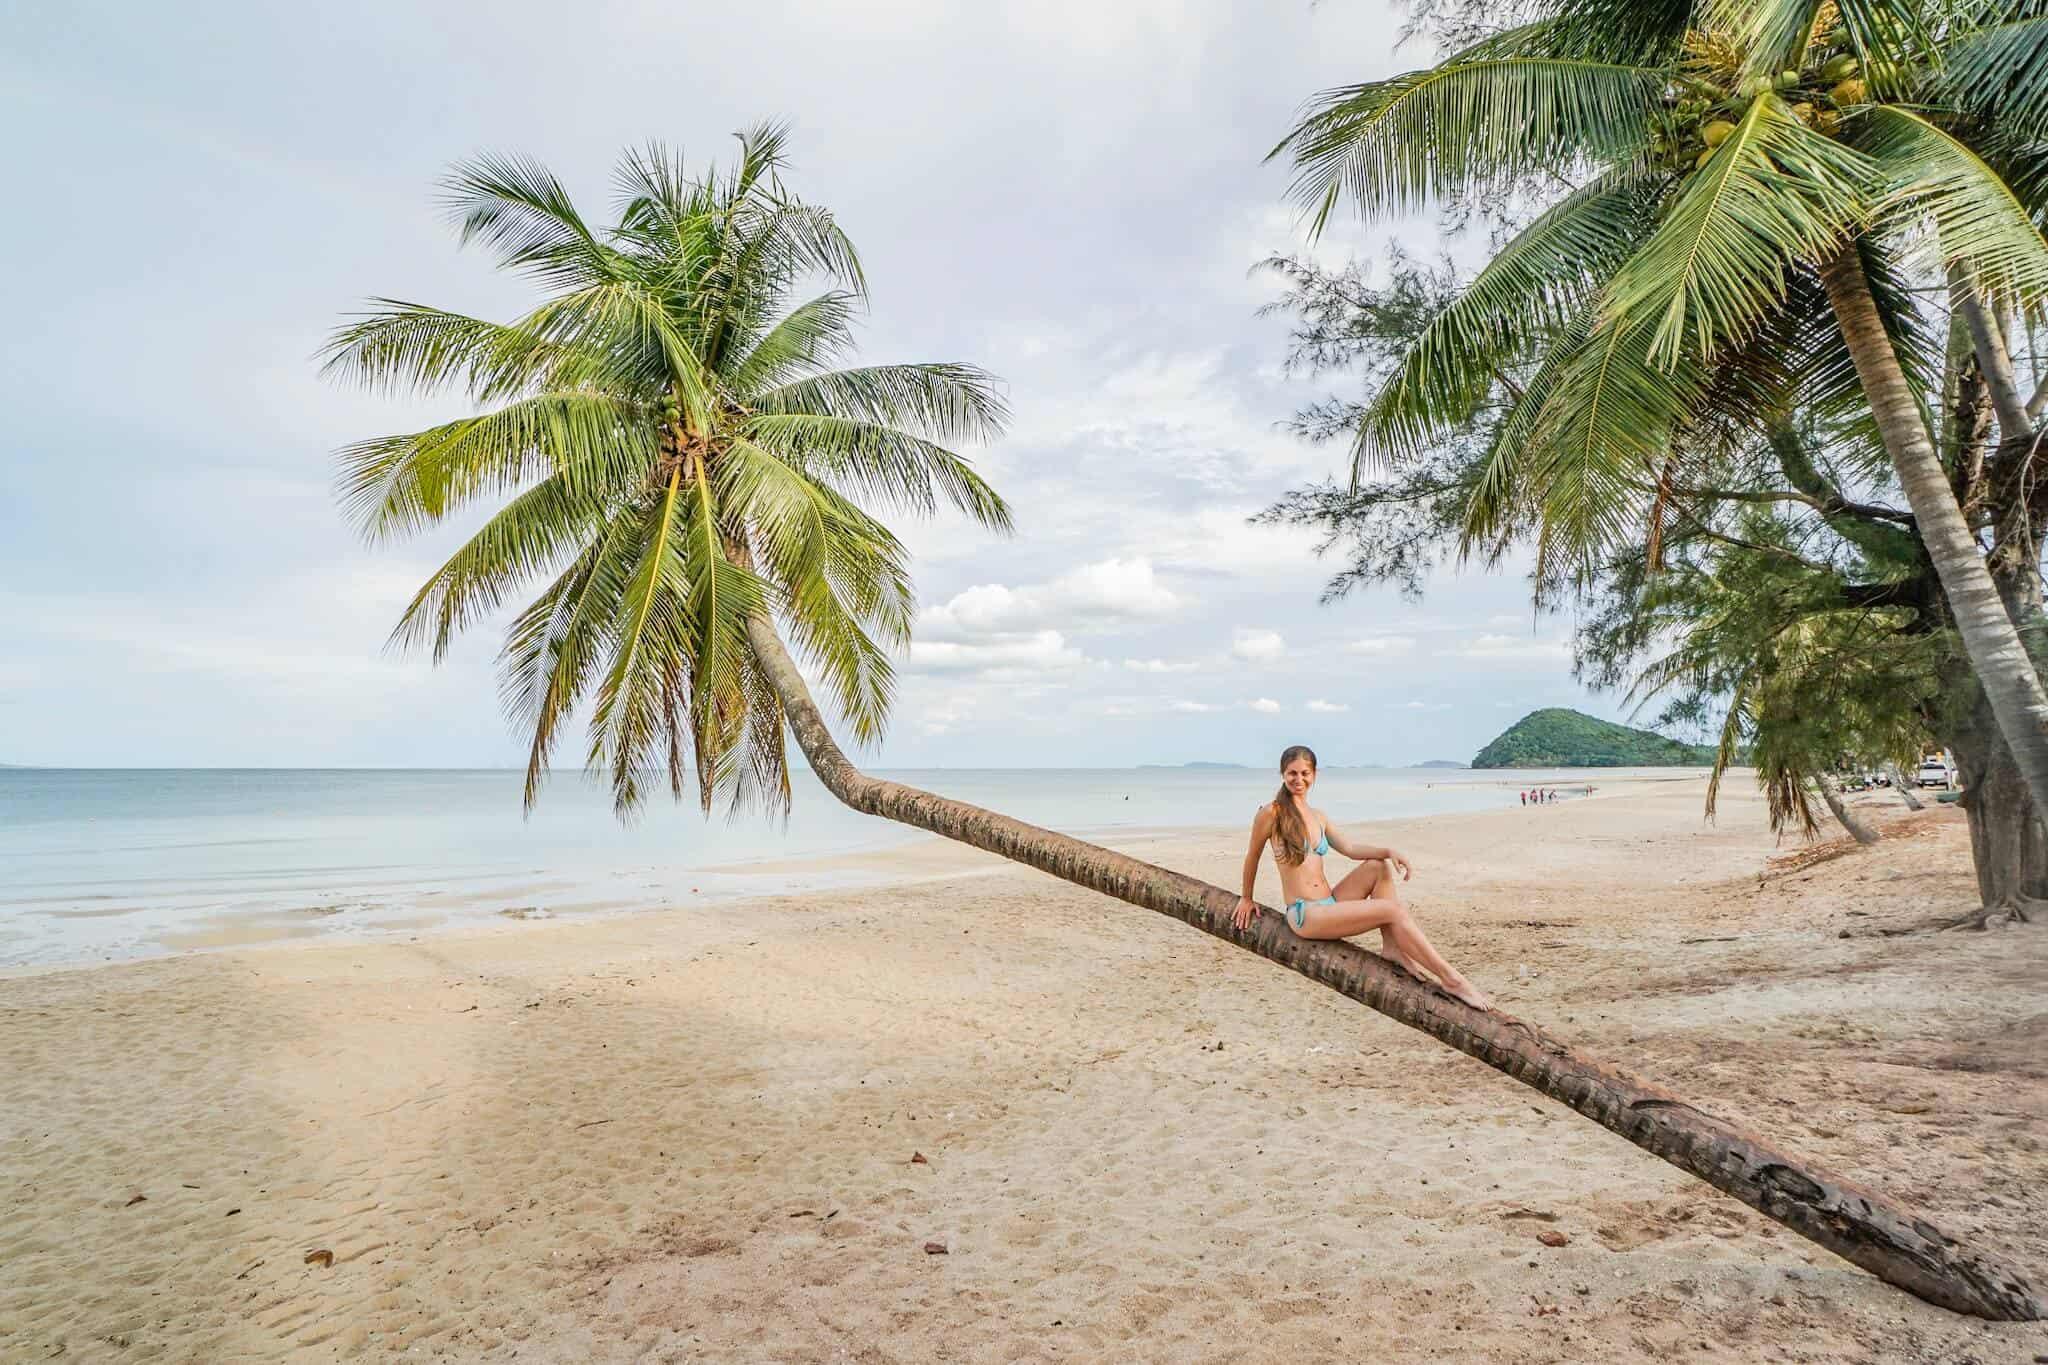 Thung Wua Lan - Chumphons schönster Strand – schiefe Palme